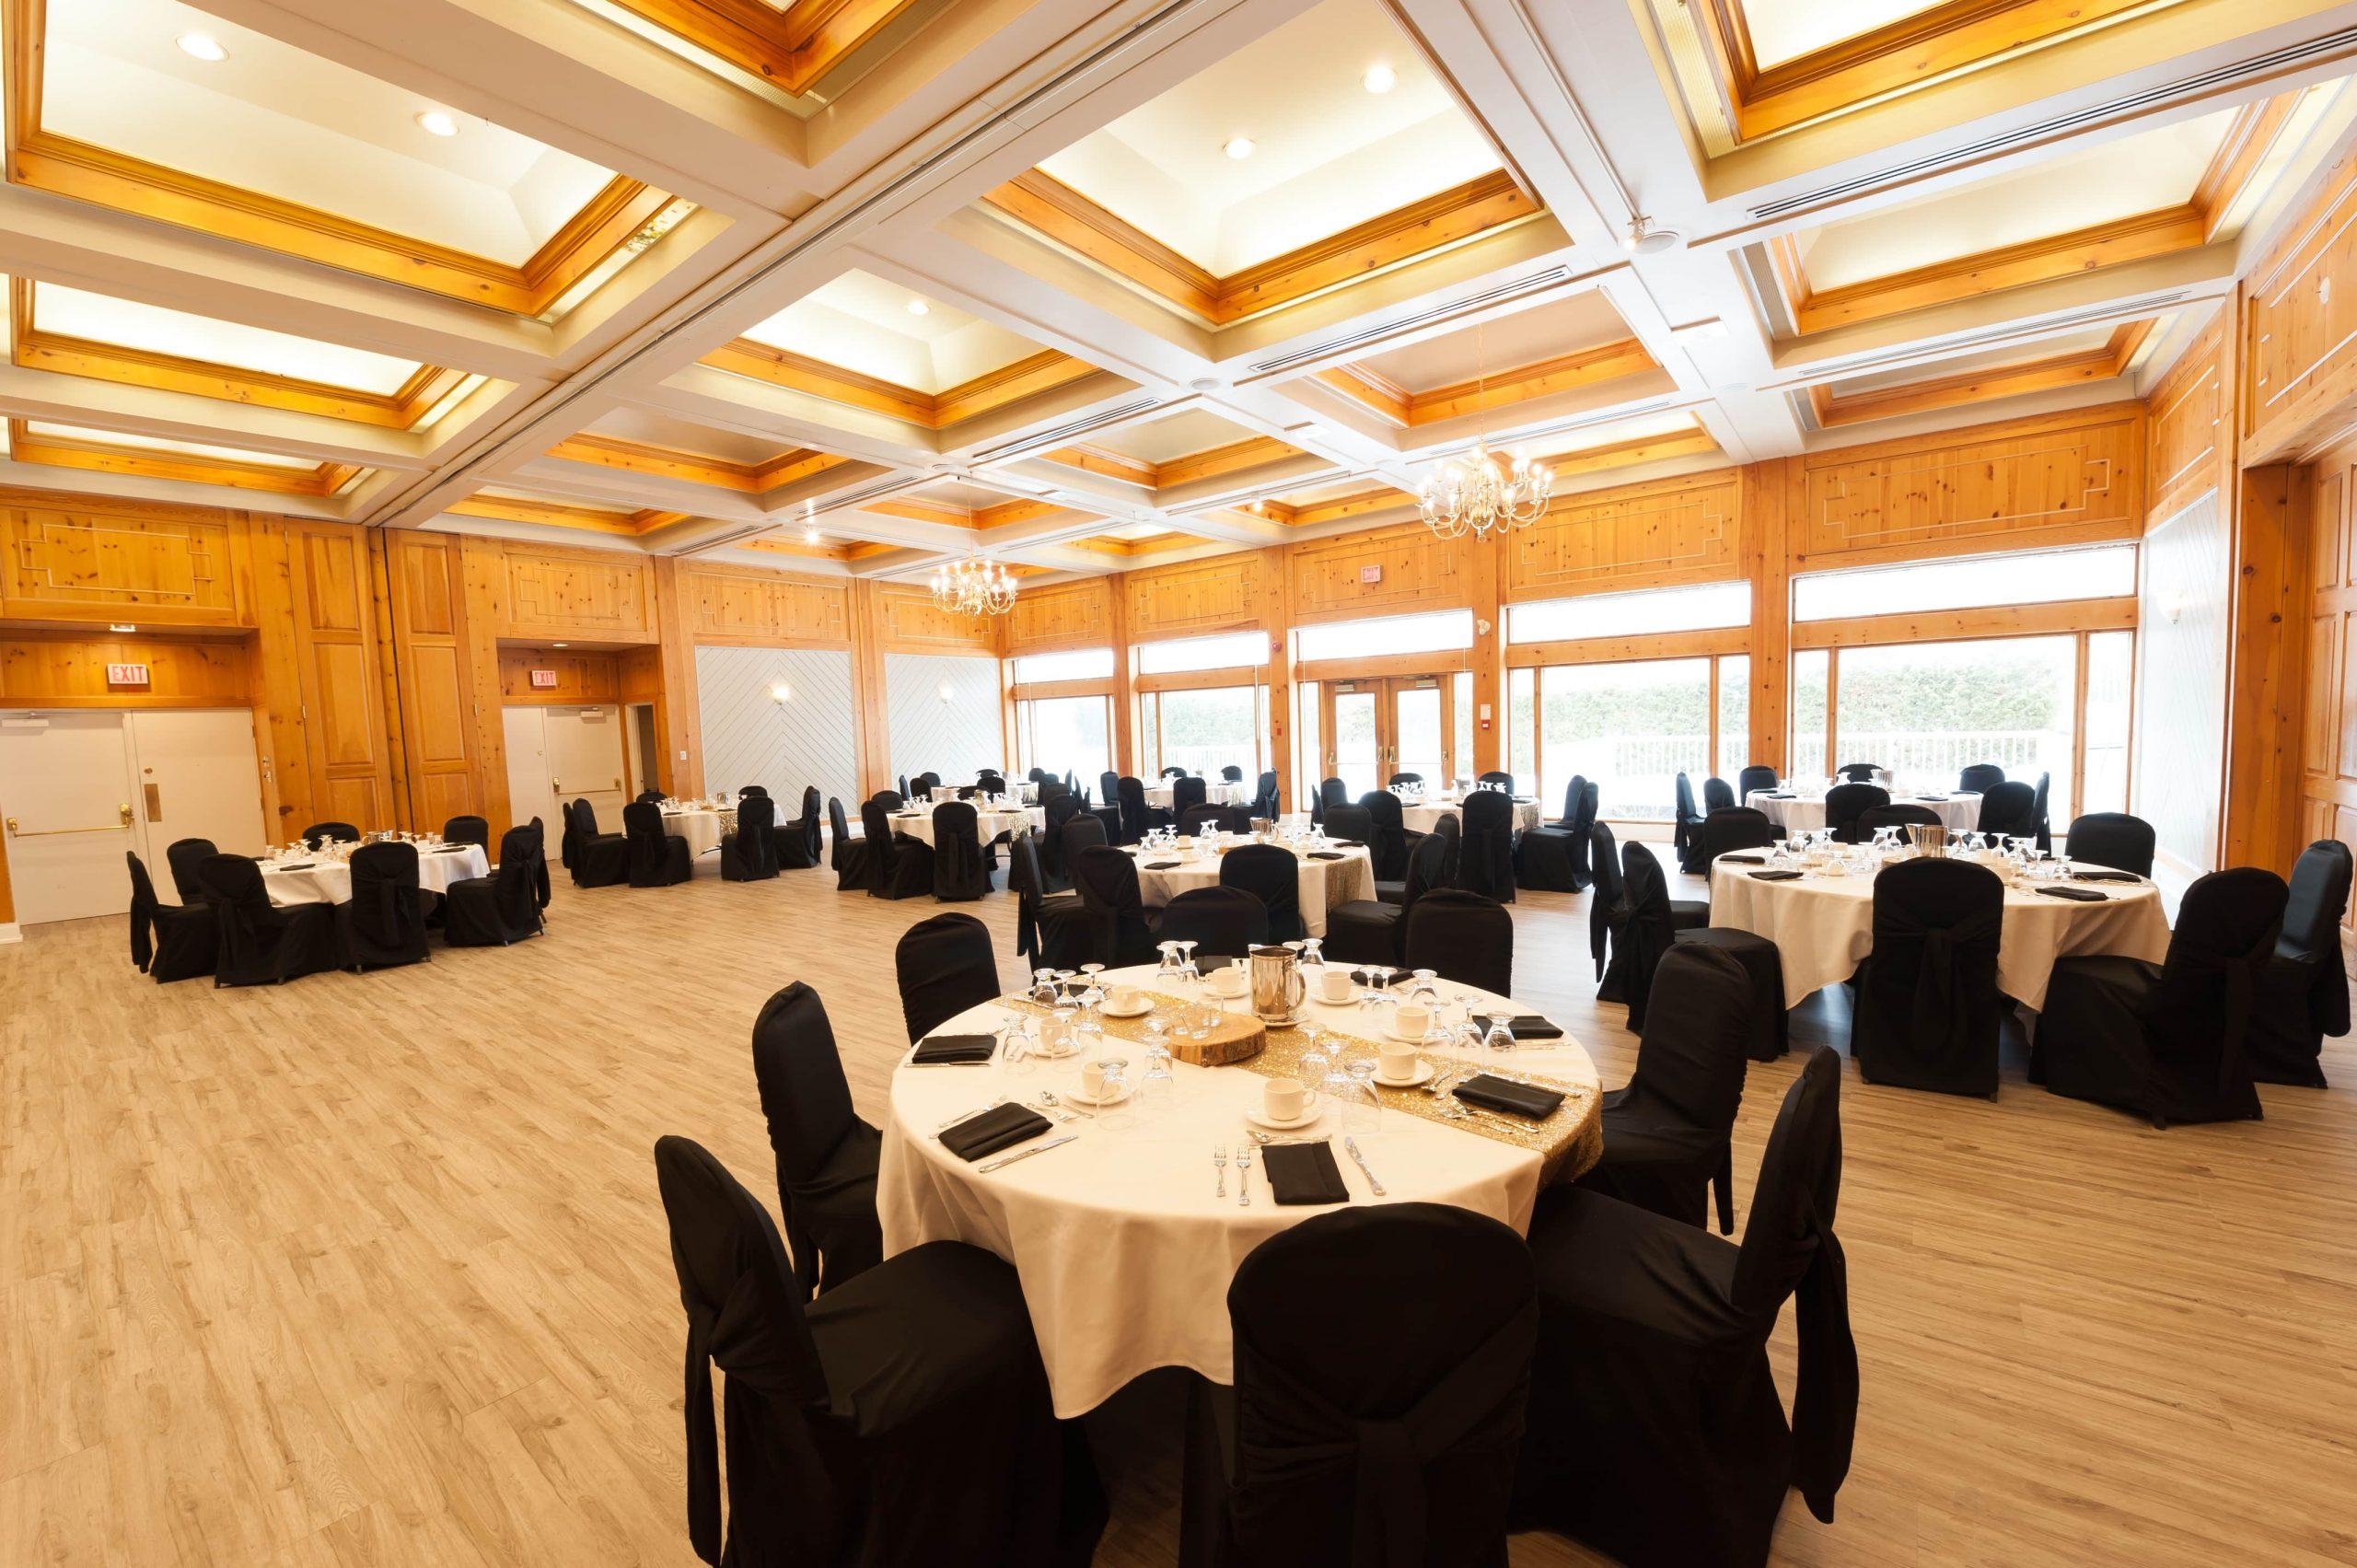 Ballroom-2 (1)